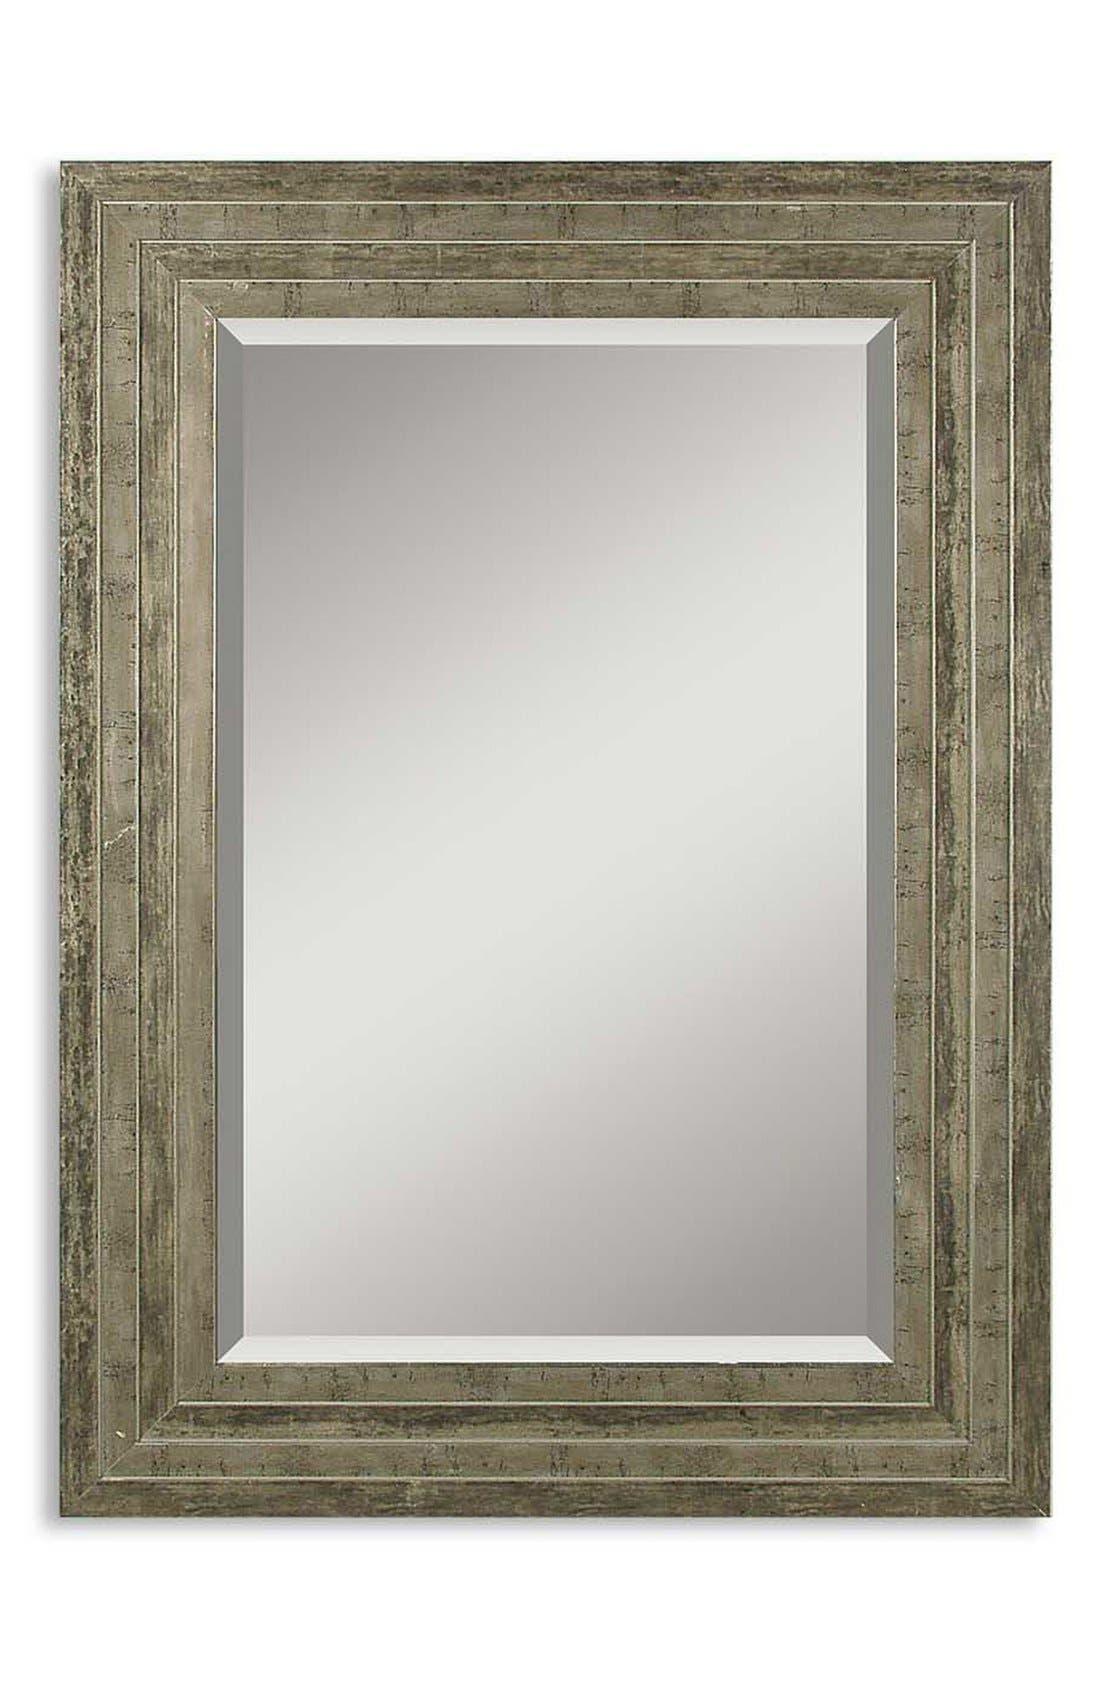 Main Image - Uttermost 'Hallmar' Wall Mirror